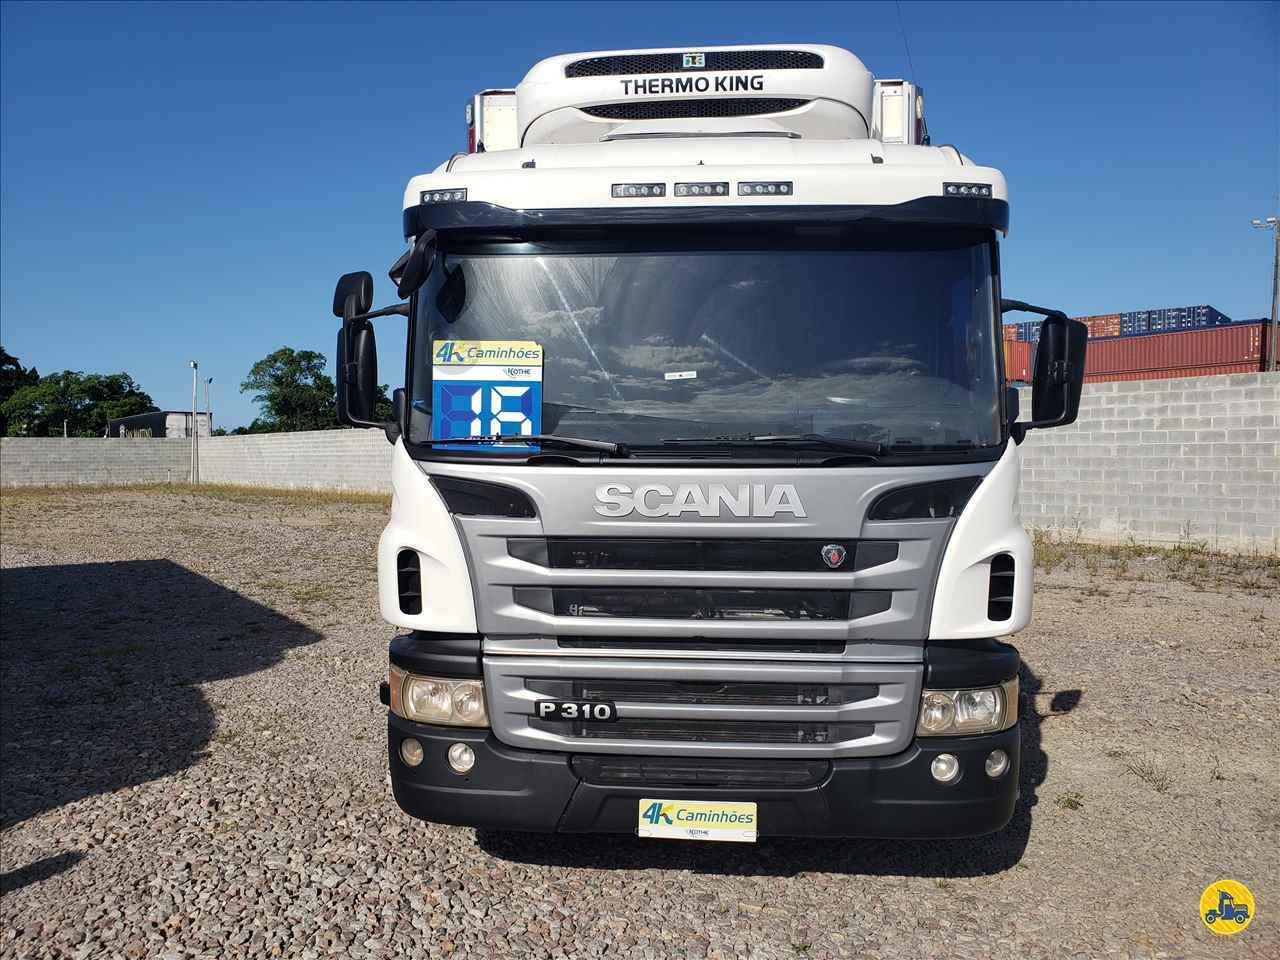 SCANIA P310 de 4K Caminhões - Itajaí - ITAJAI/SC